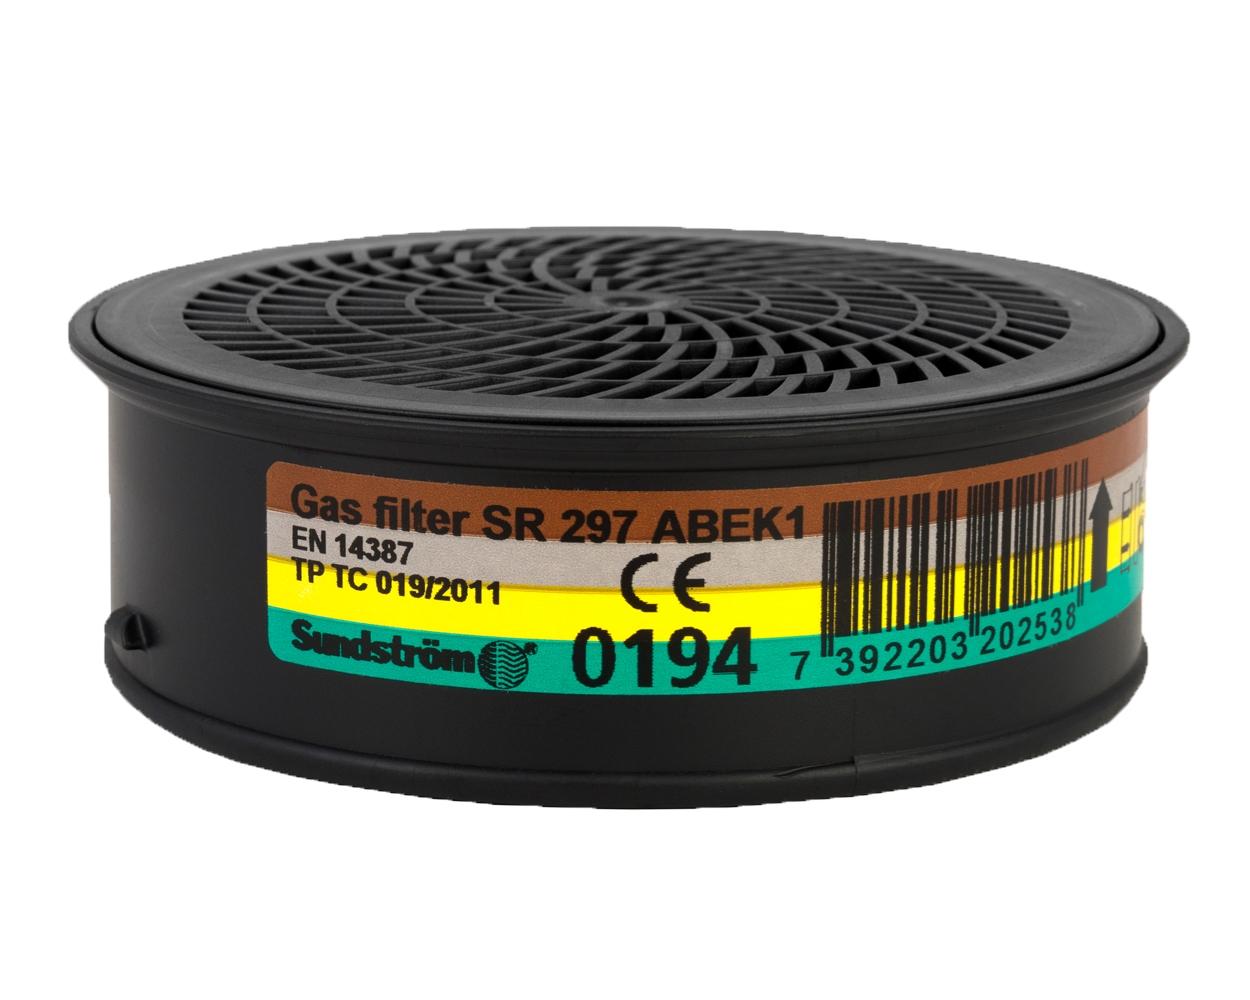 SR297 Gassfilter ABEK1 pk à 4